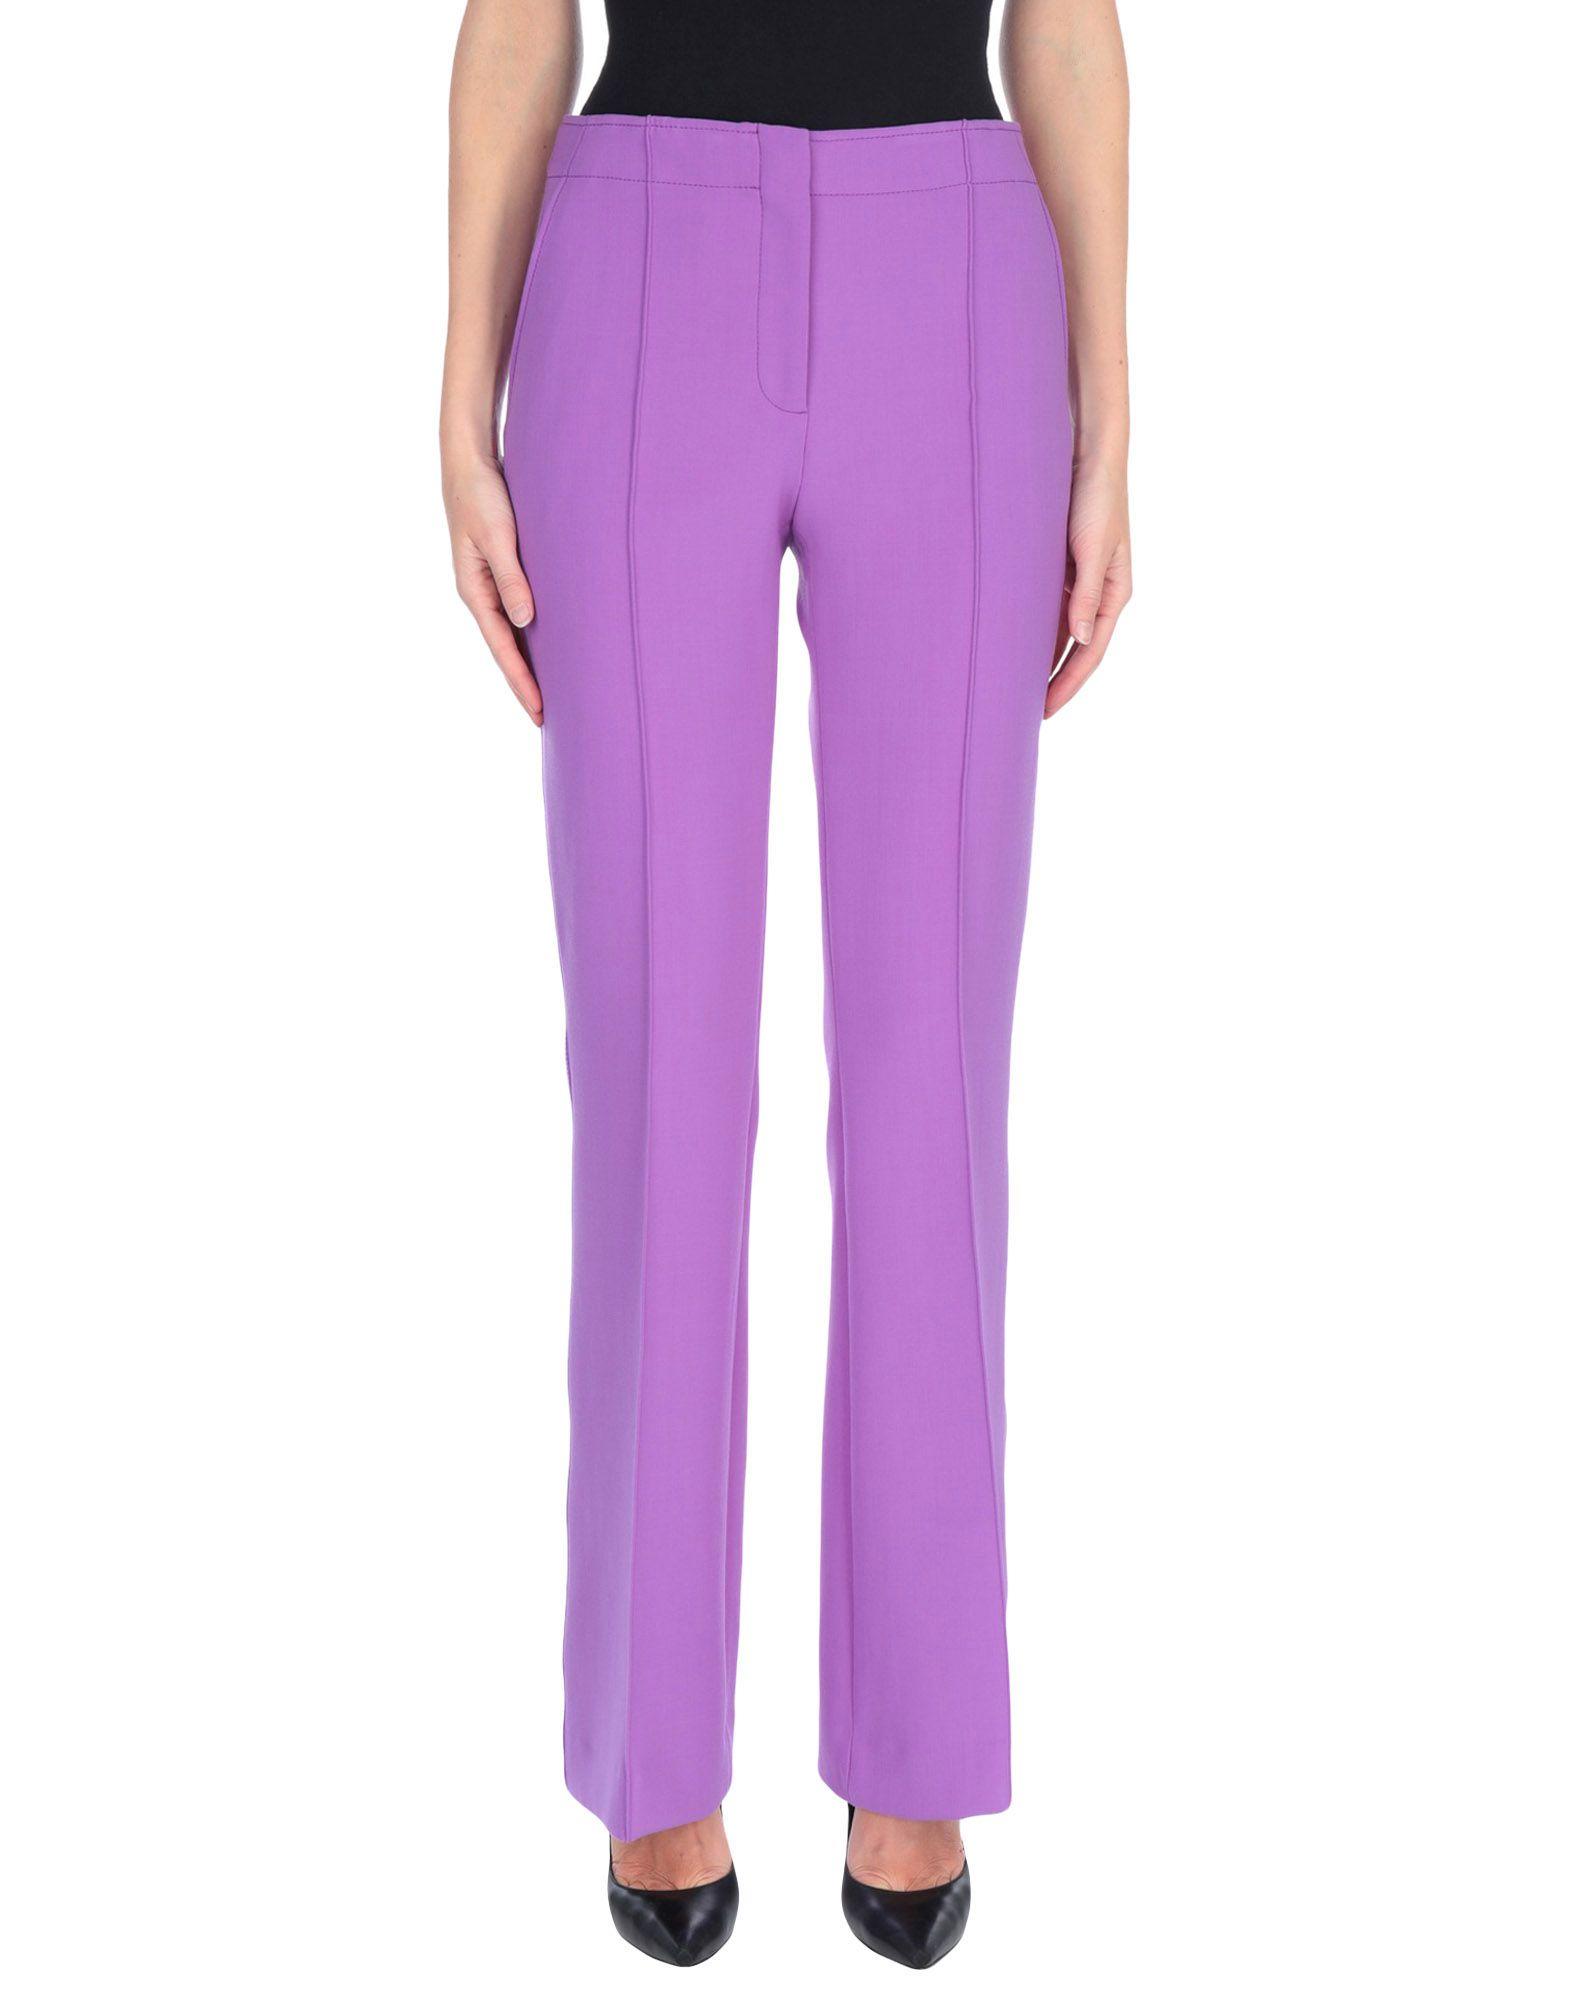 Pantalone Victoria, Victoria Beckham donna - 13321852SV 13321852SV  preiswert